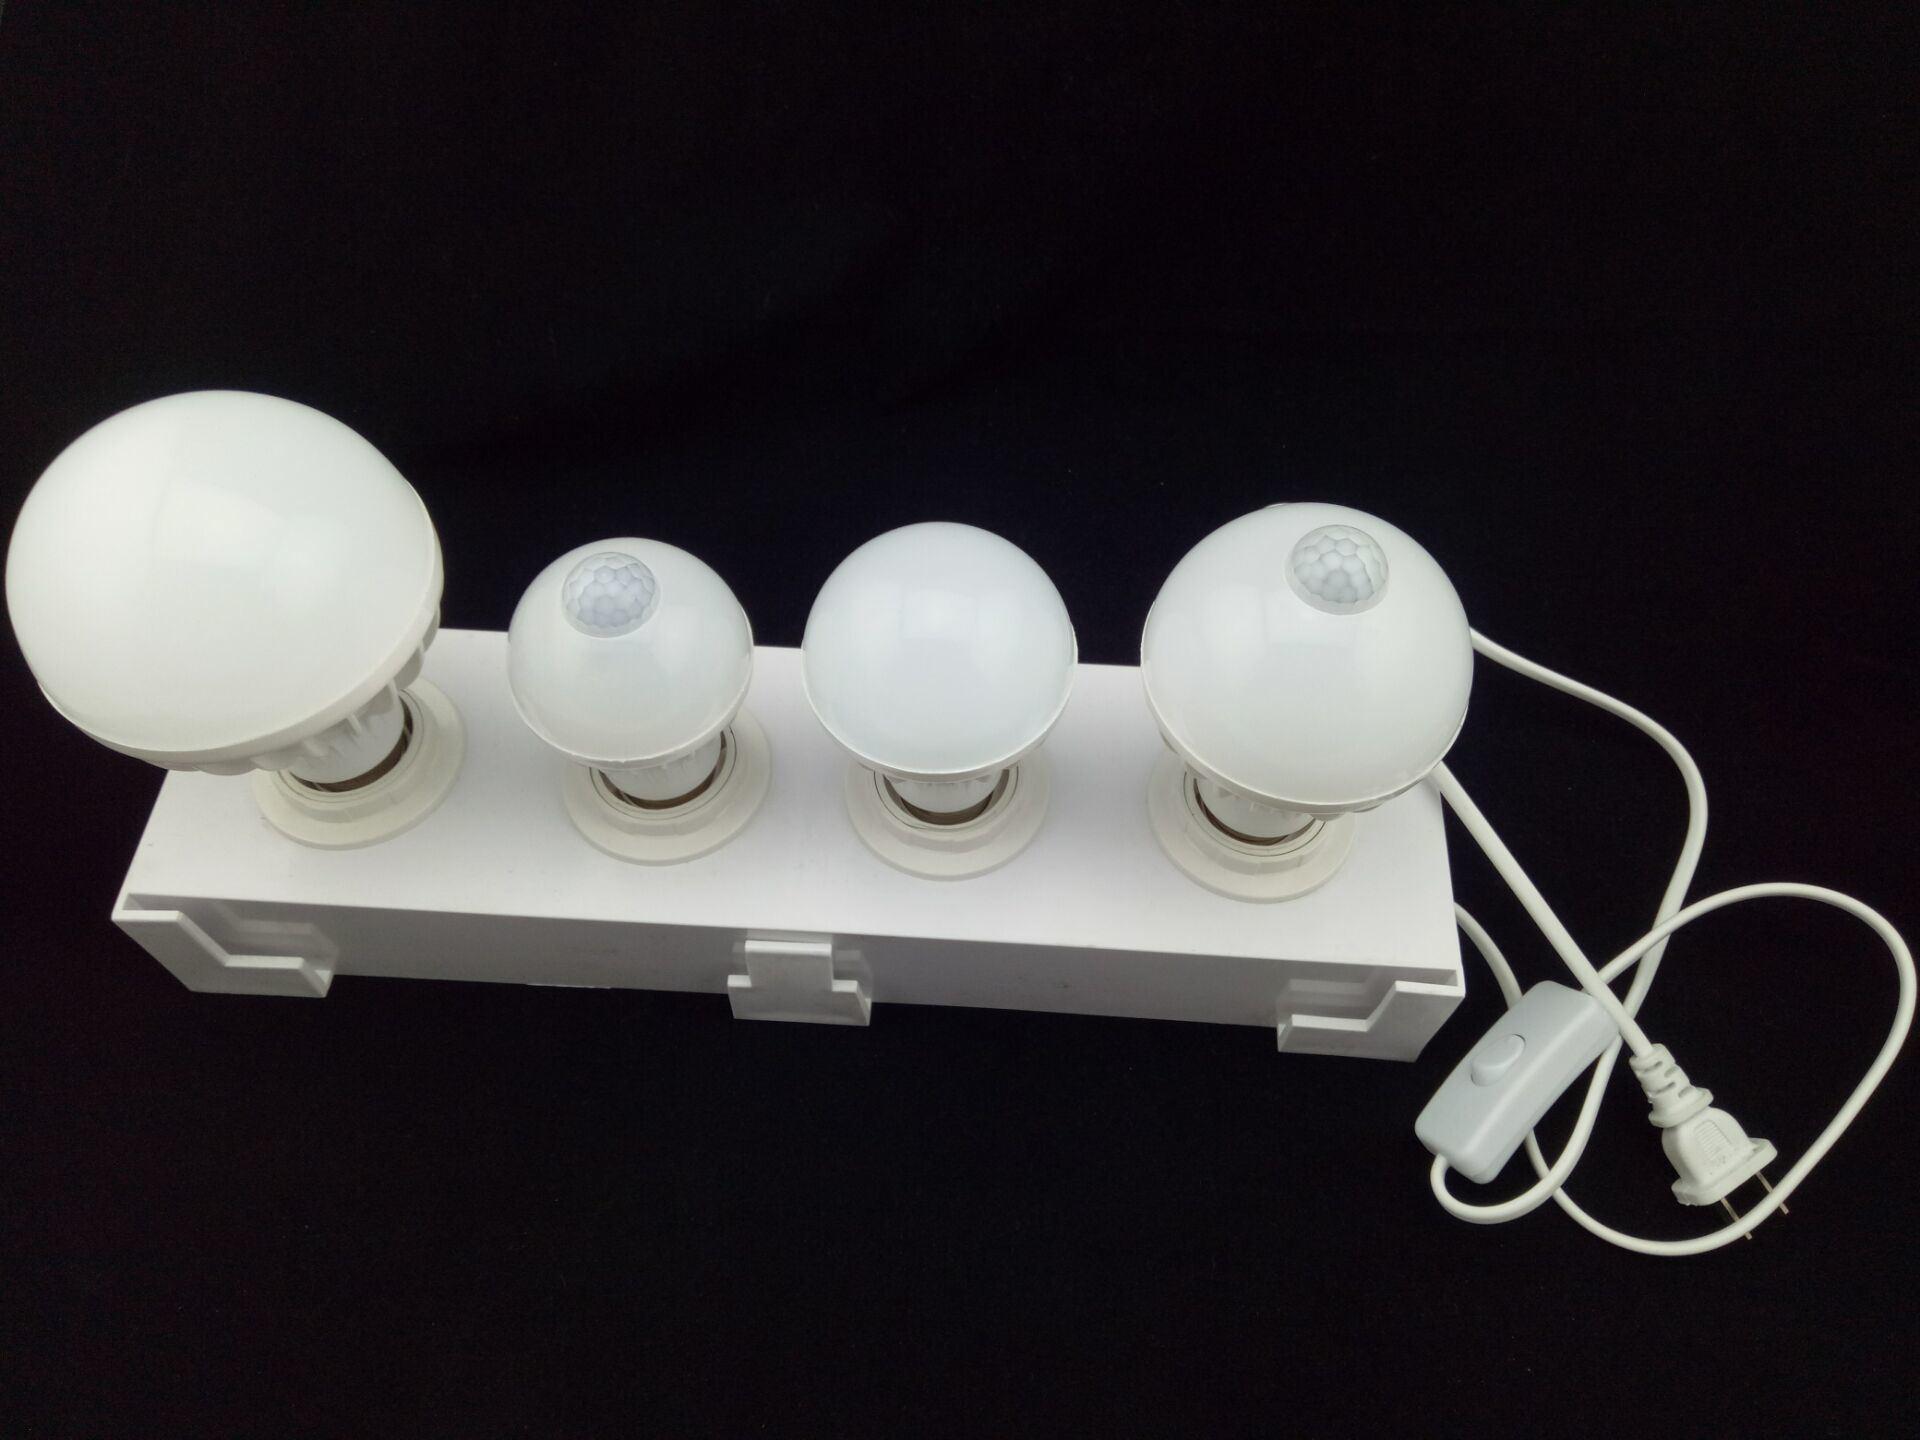 E27 E14 B22 LED Emergency Lighting, Sound Control Bulb